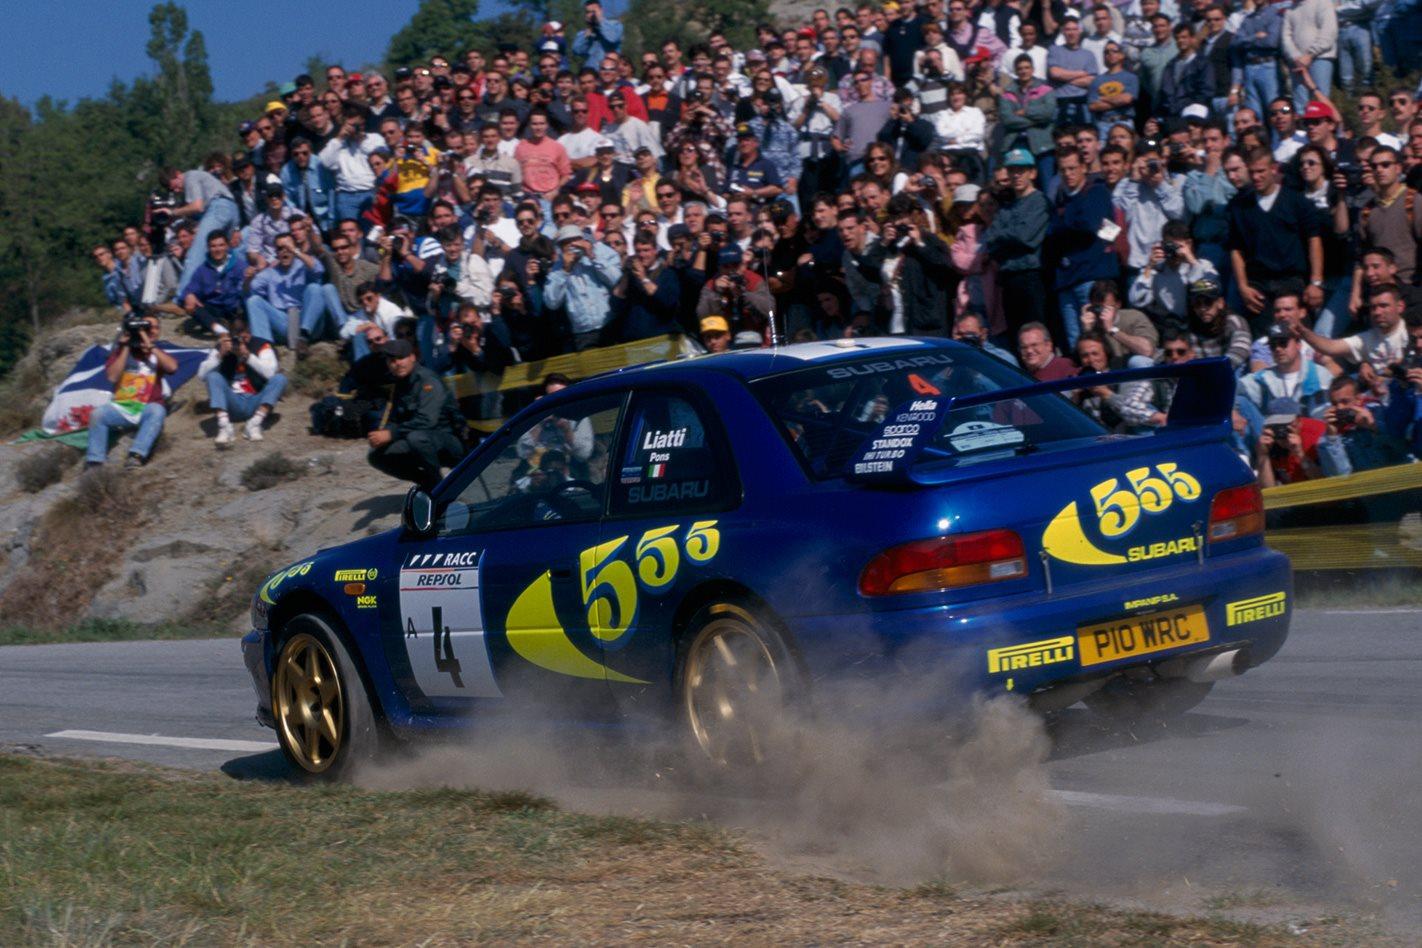 Subaru Impreza WRC racing